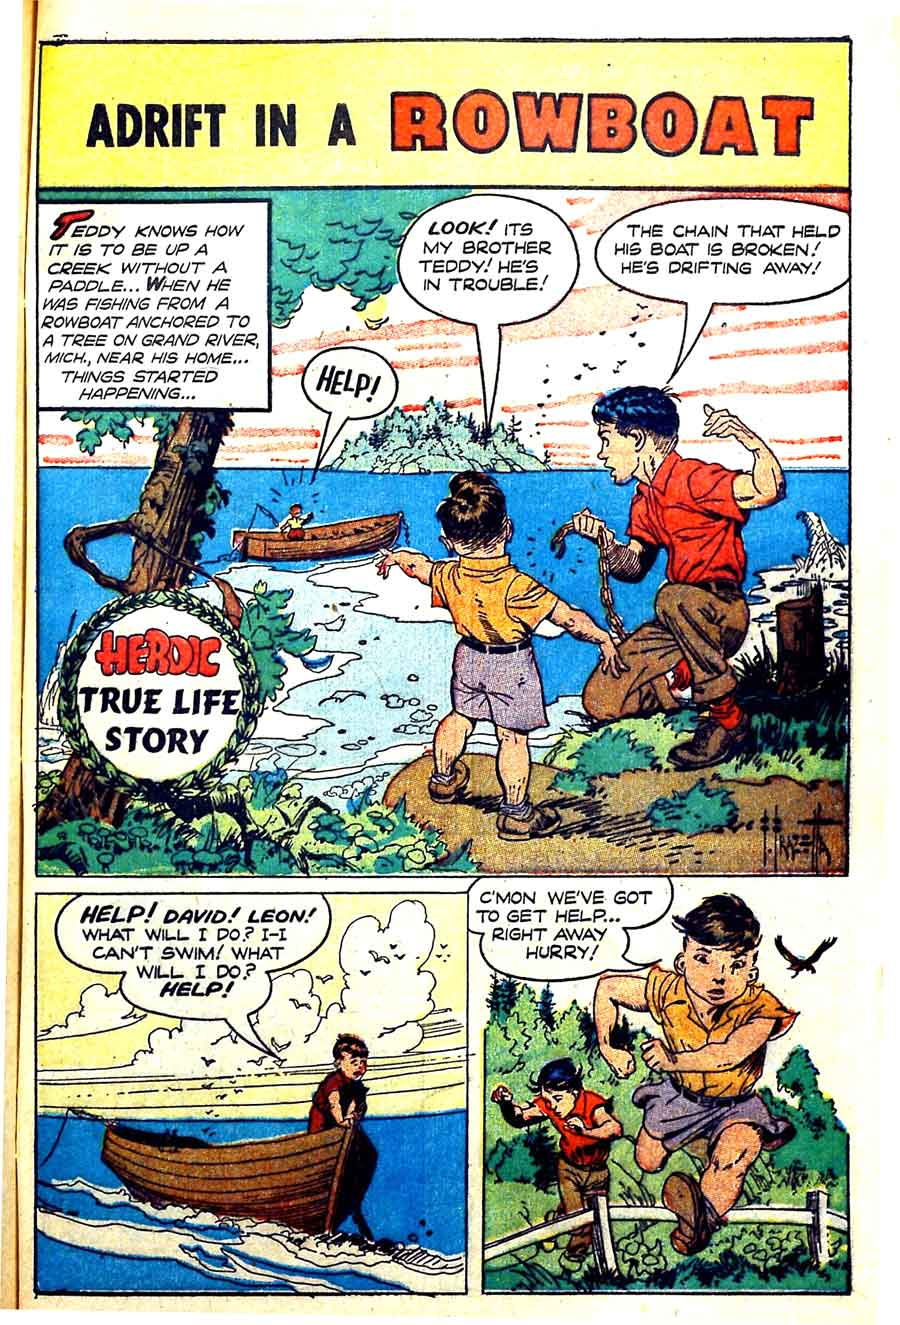 Heroic Comics #66 golden age 1950s comic book page art by Frank Frazetta